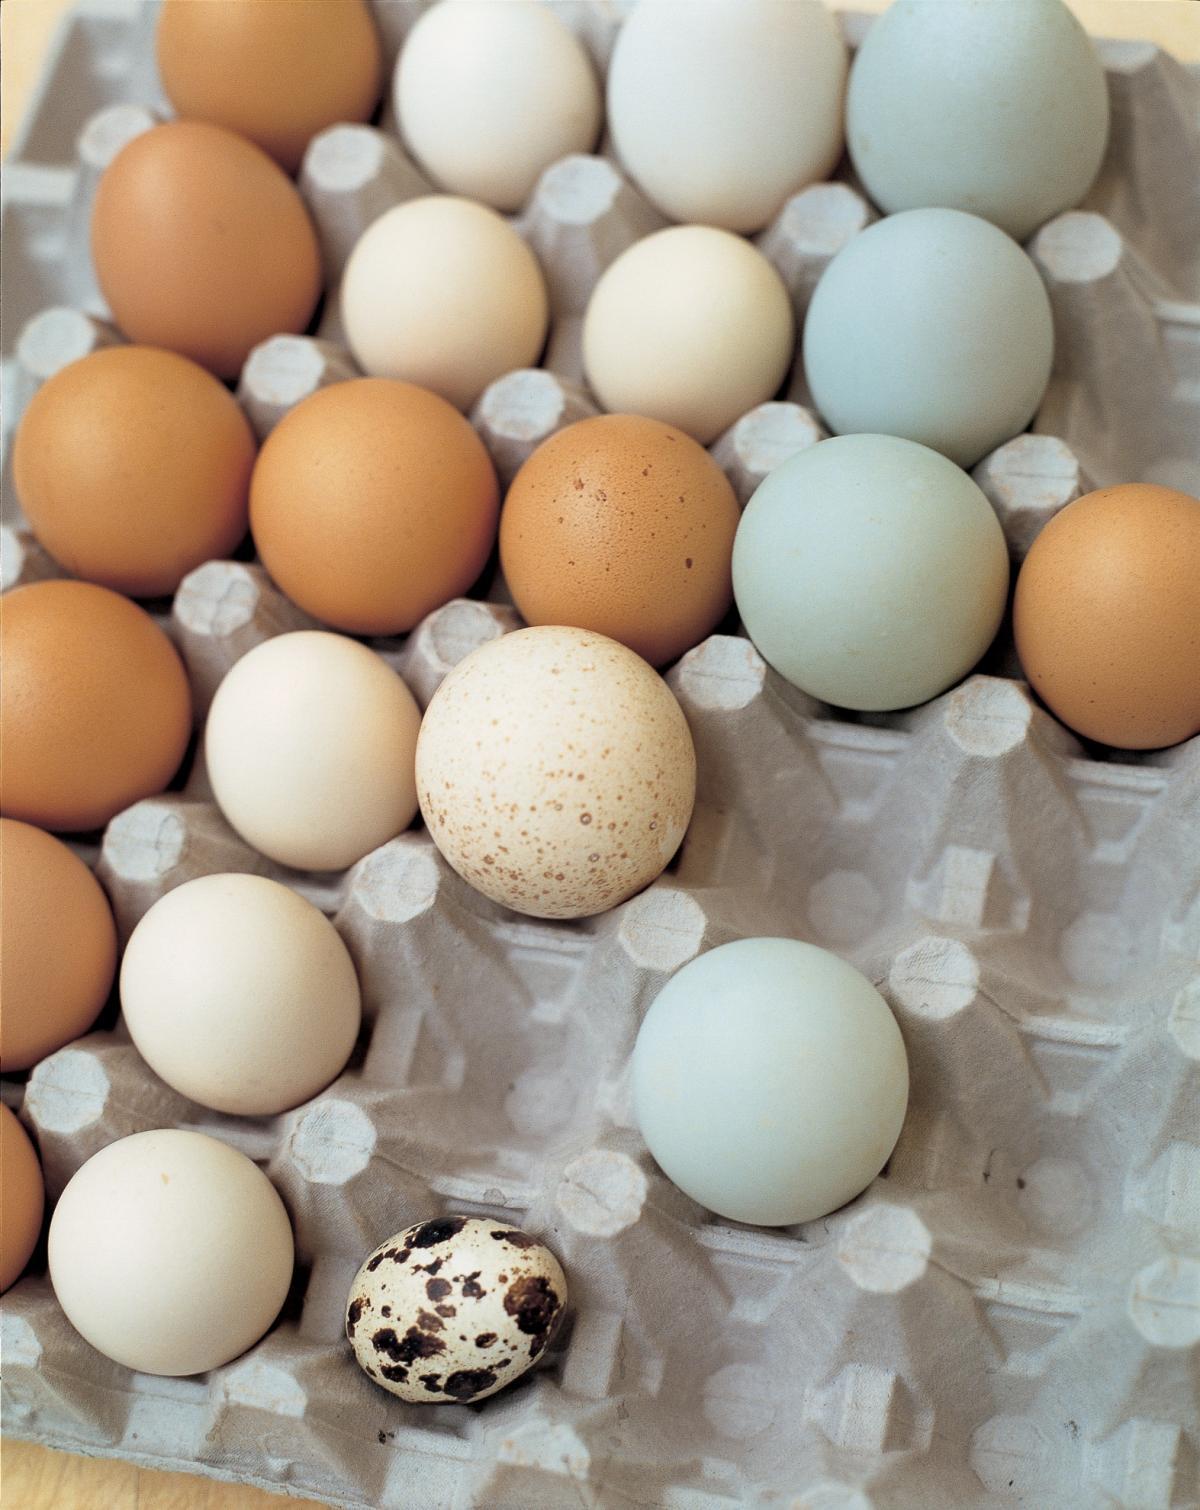 Egg yolk consumption, carotid plaque & bad science